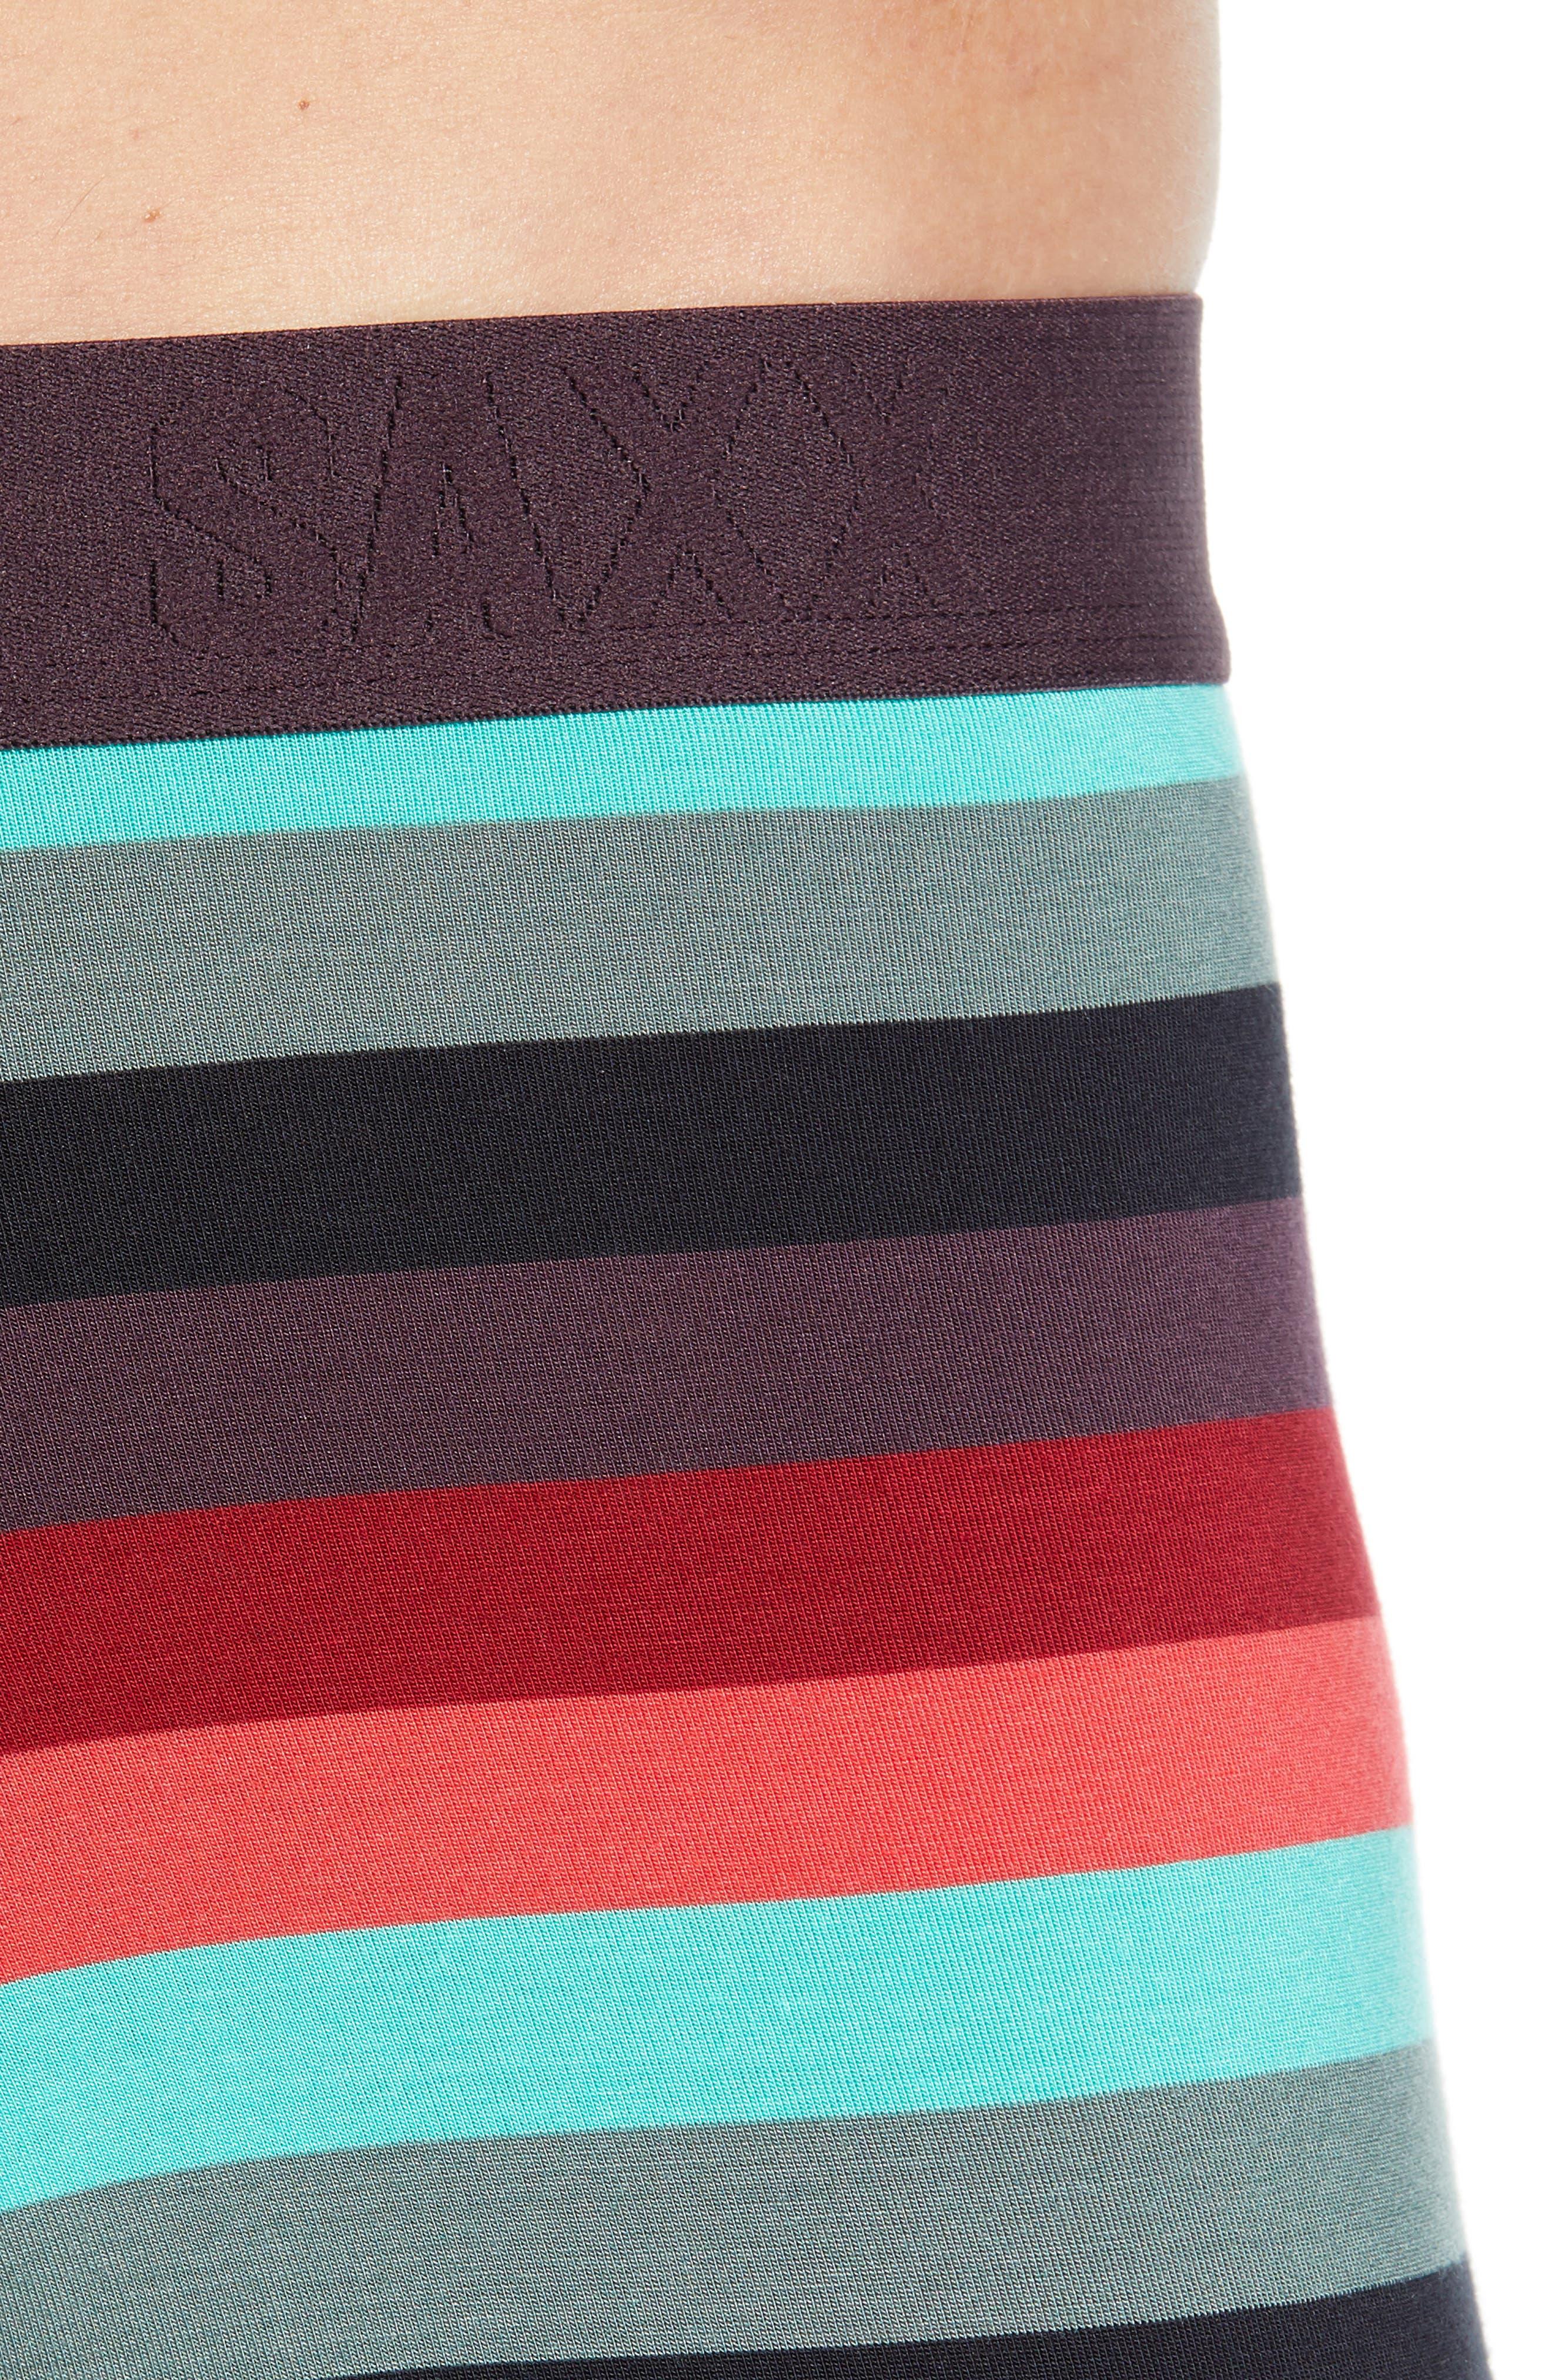 Ultra Cabana Stripe Stretch Boxer Briefs,                             Alternate thumbnail 4, color,                             BERRY CABANA STRIPE